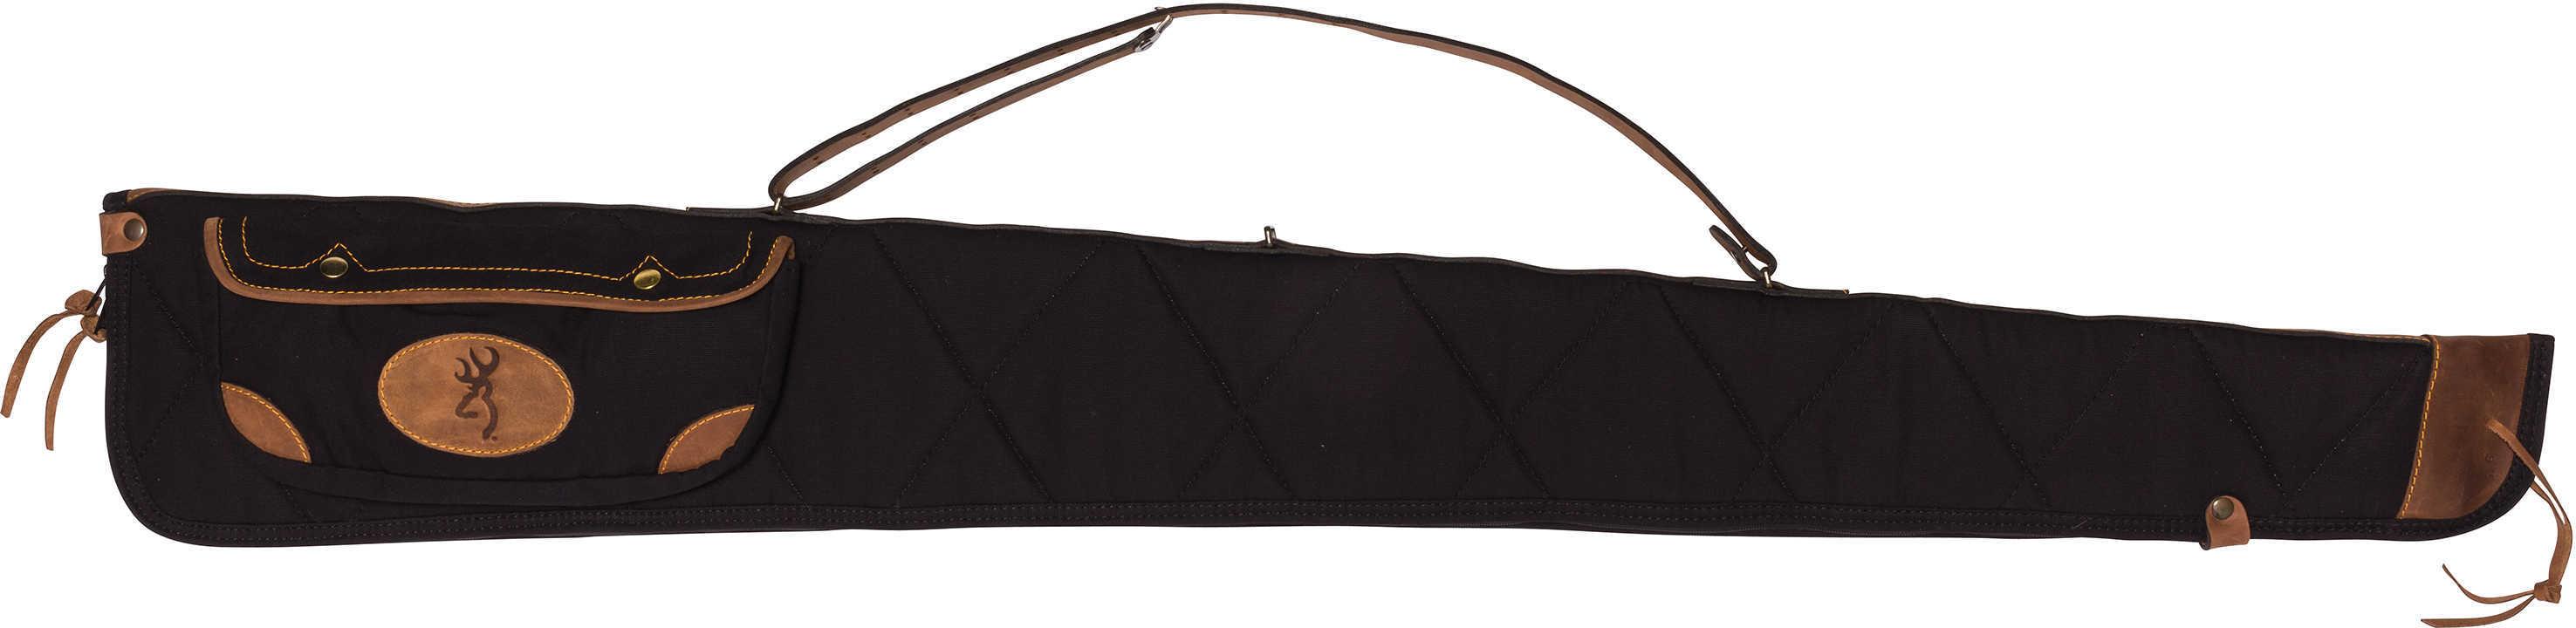 "Browning Lona Case 52"", Canvas/Leather Shotgun Case, Black/Brown Md: 1413889952"